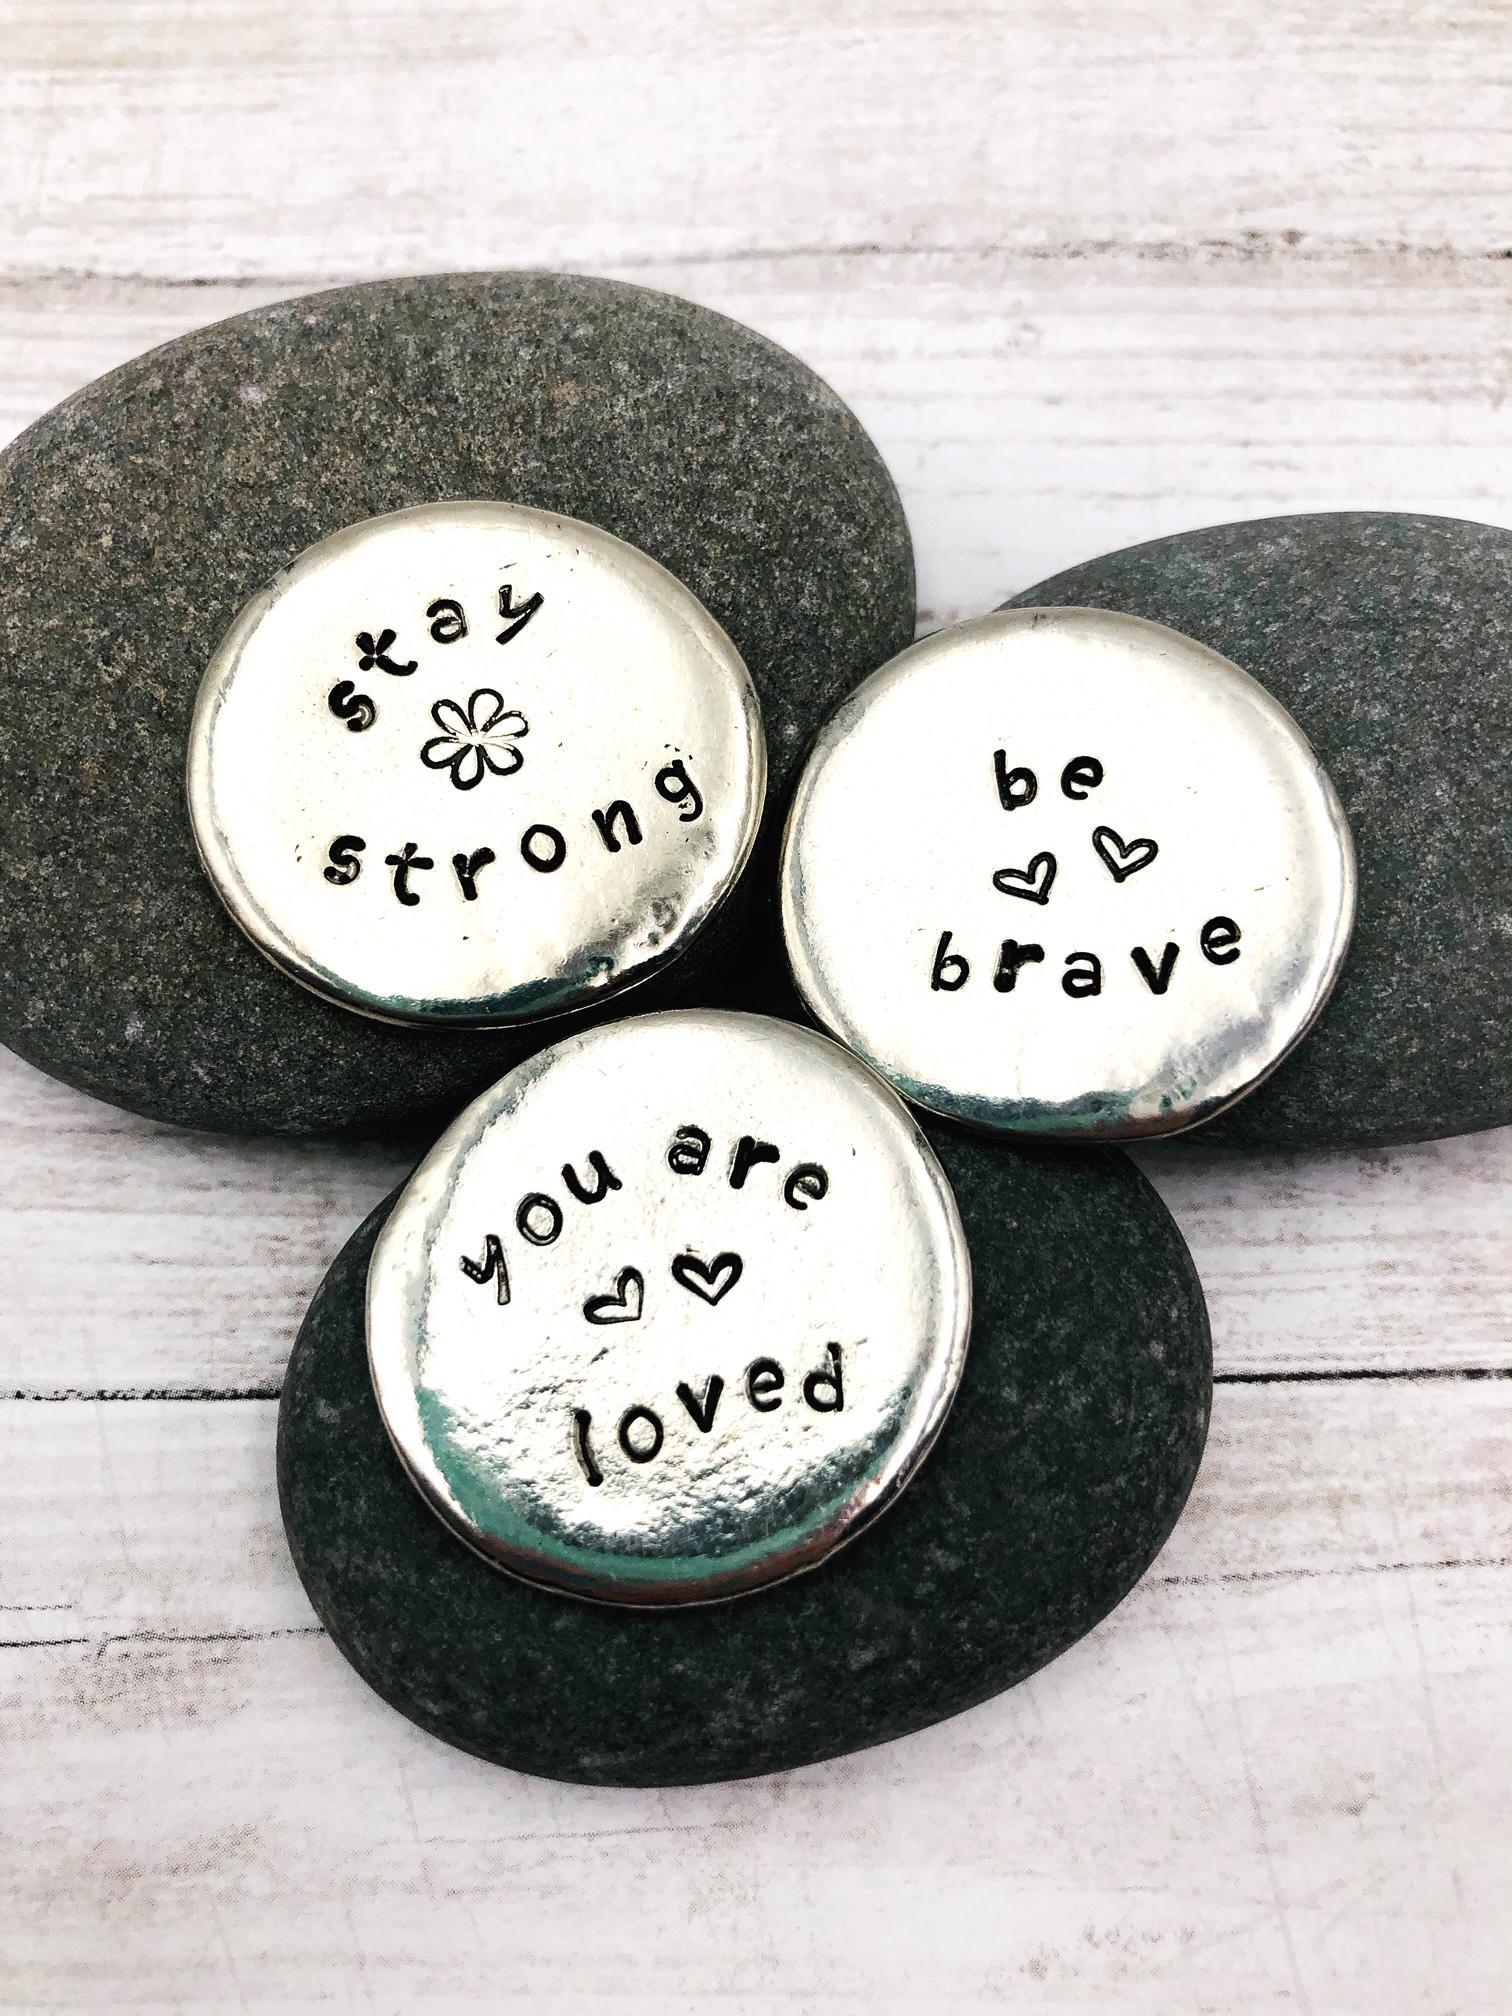 strong brave loved1.JPG